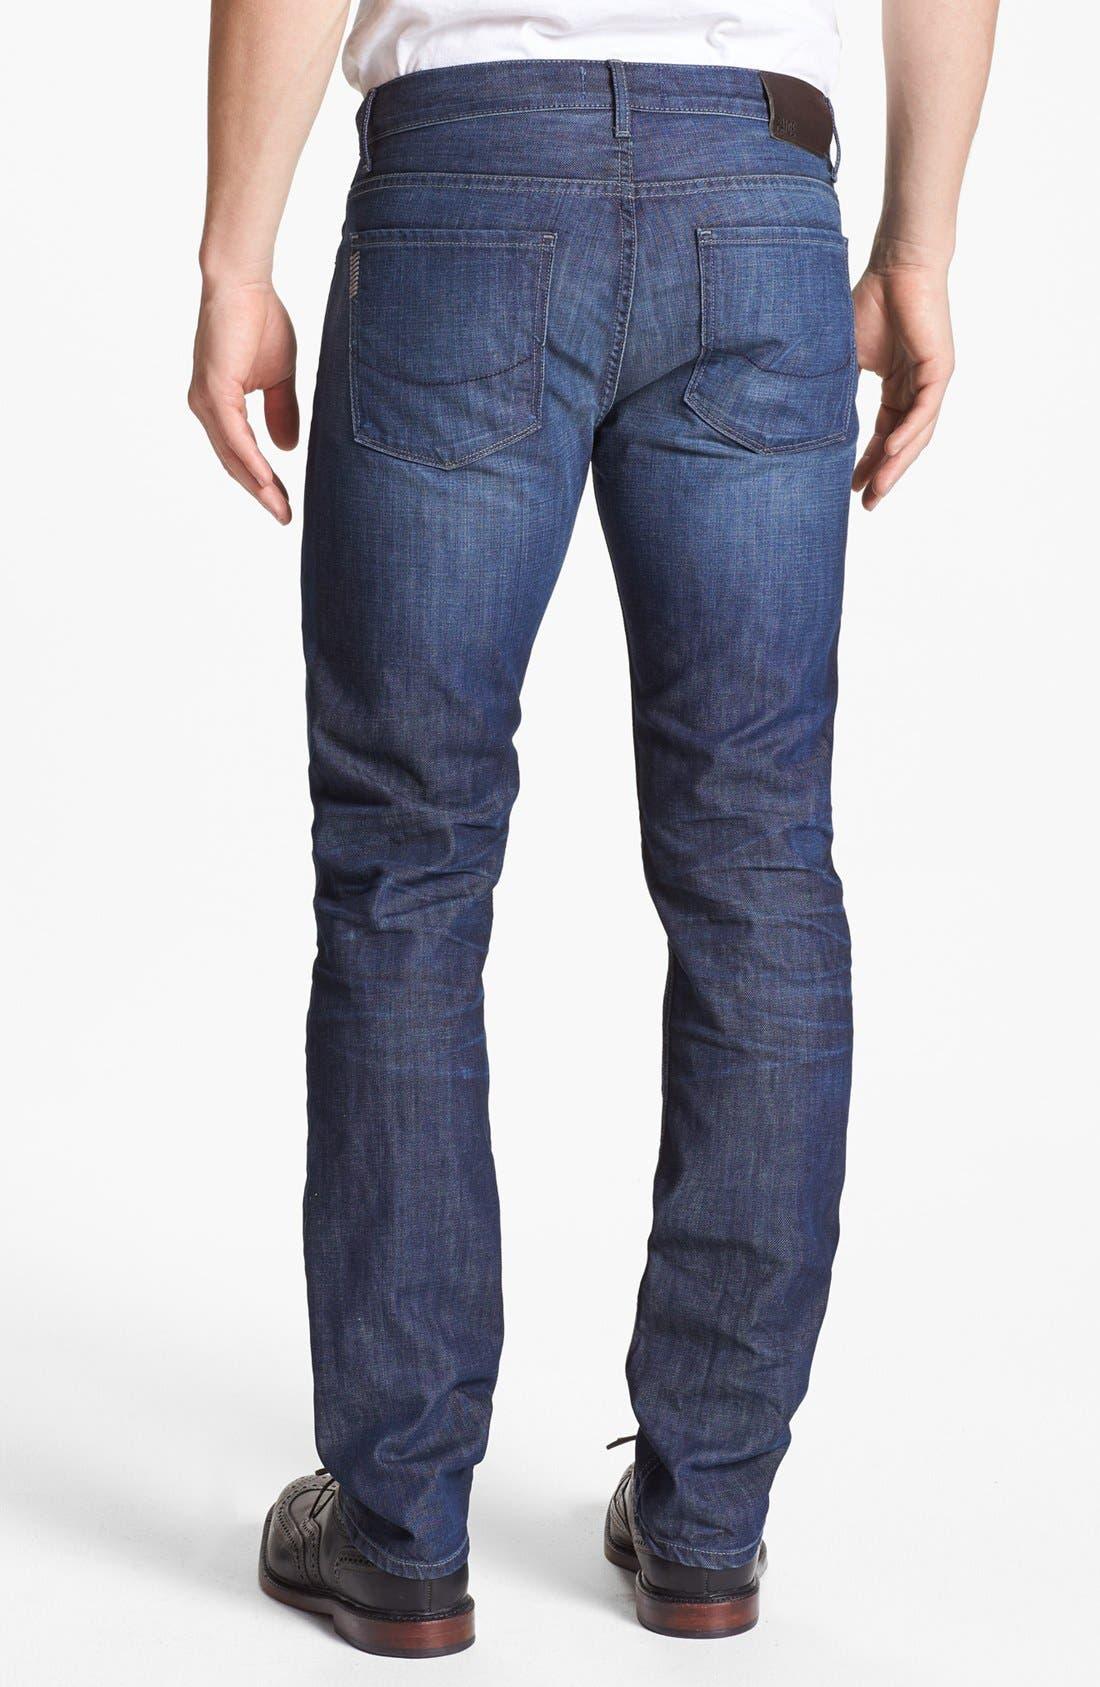 Alternate Image 1 Selected - PAIGE 'Federal' Slim Fit Jeans (Peak)